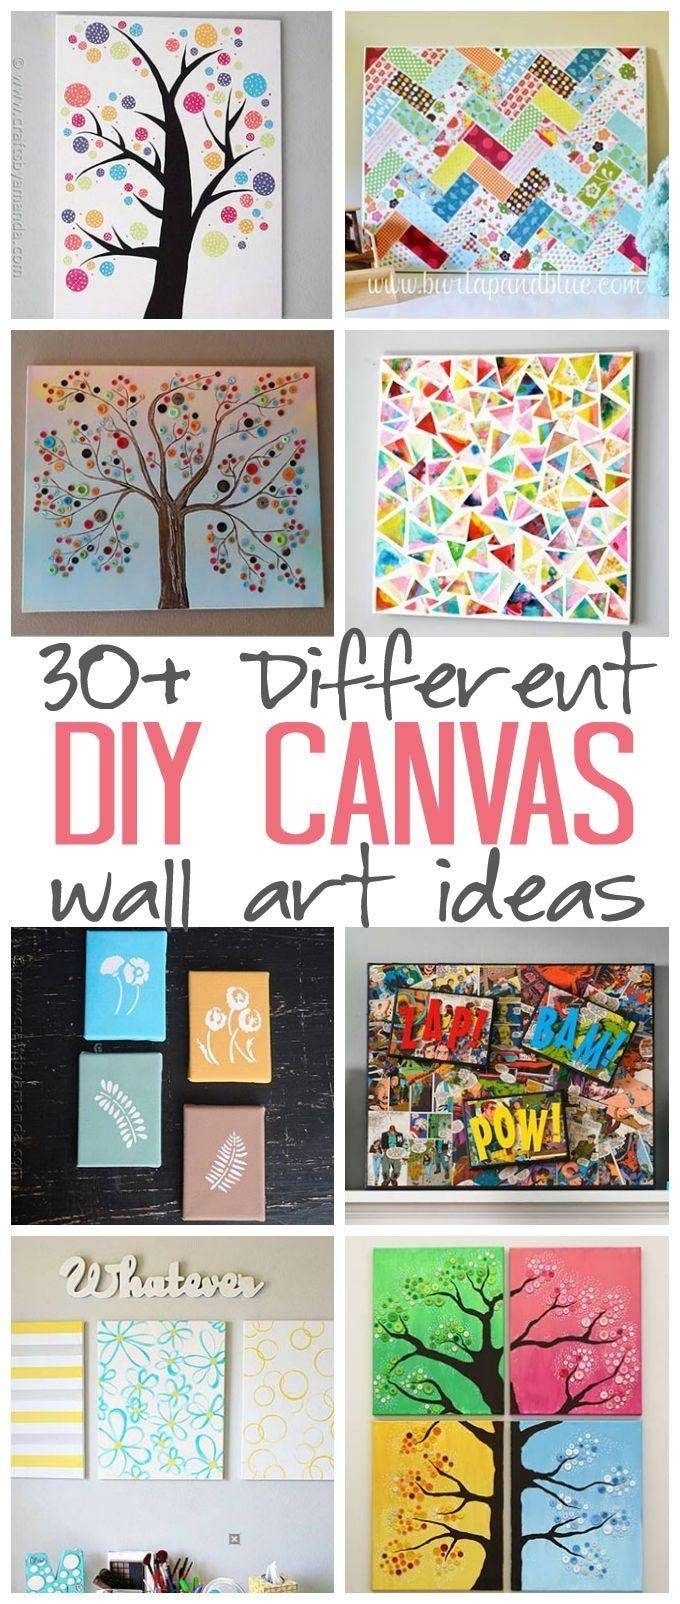 25+ Unique Canvas Wall Art Ideas On Pinterest | Diy Canvas Art Intended For Latest Diy Pinterest Canvas Art (View 1 of 25)